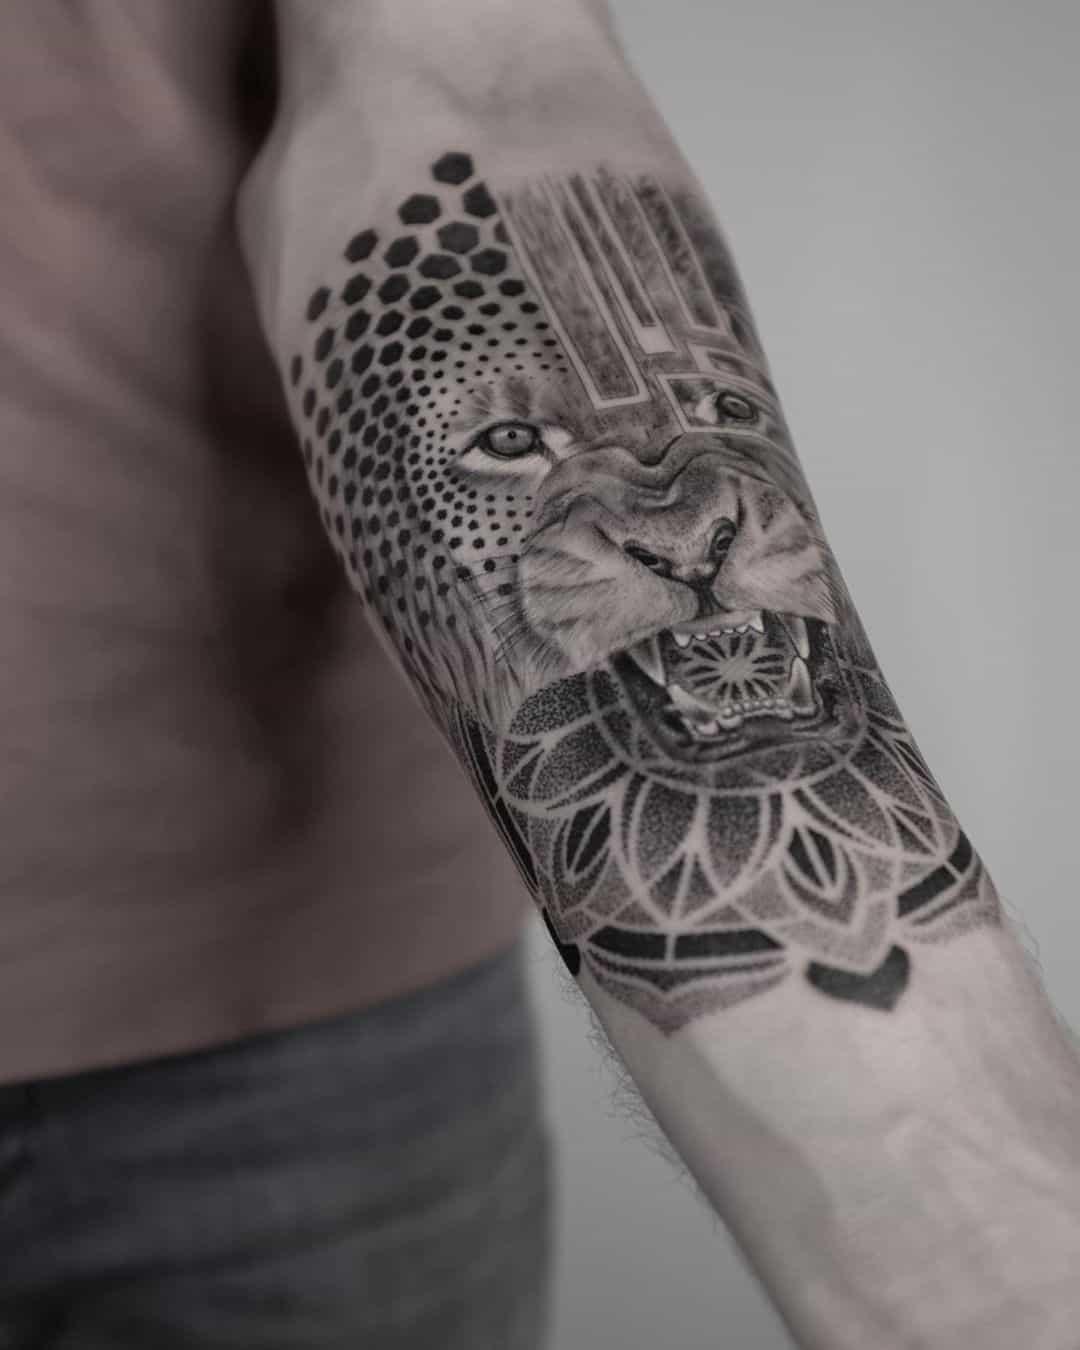 Mandala Tattoo Arm Design Lion Inspired